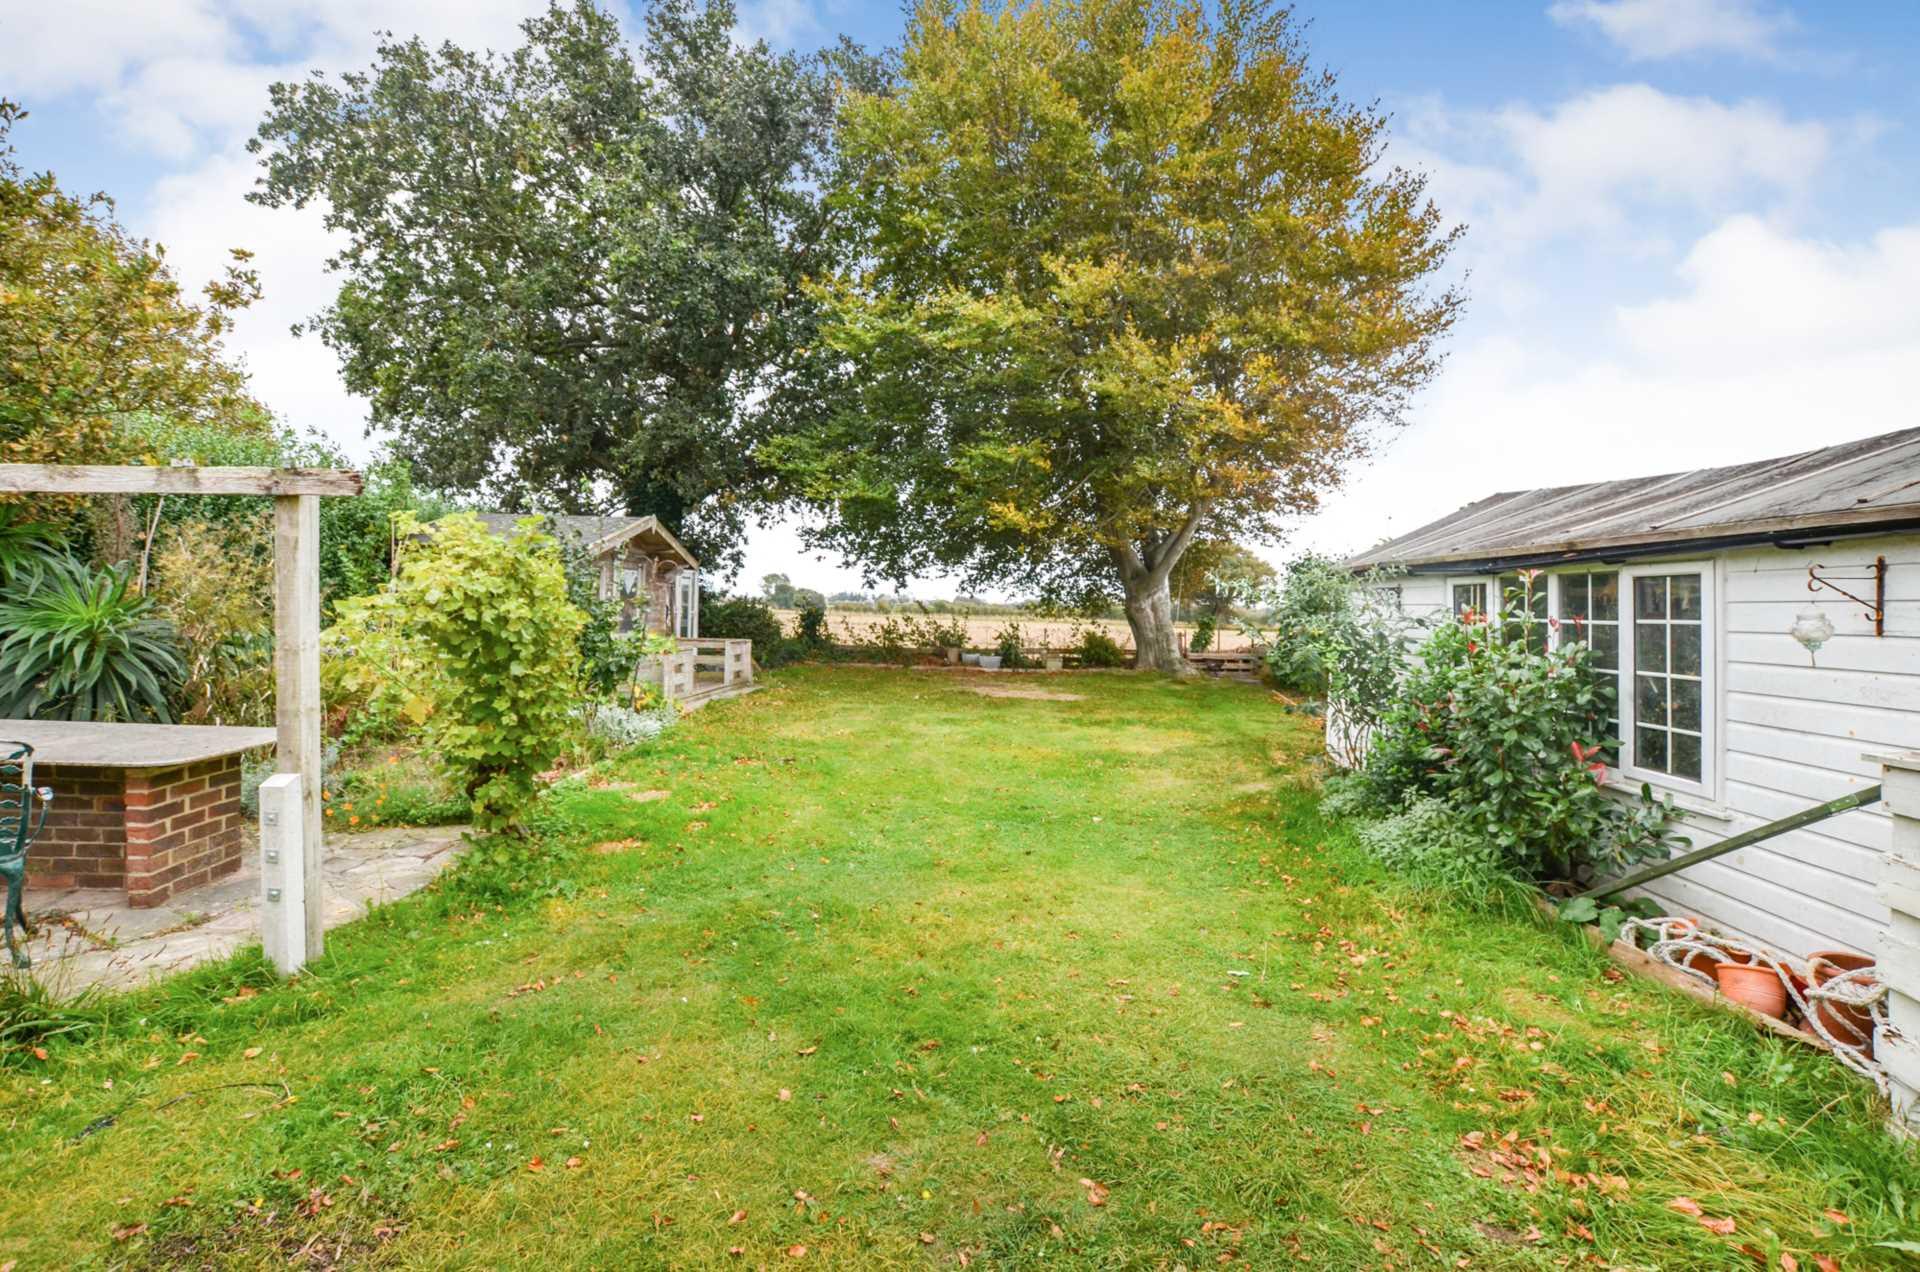 Birdham Road, Donnington, Chichester, Image 12